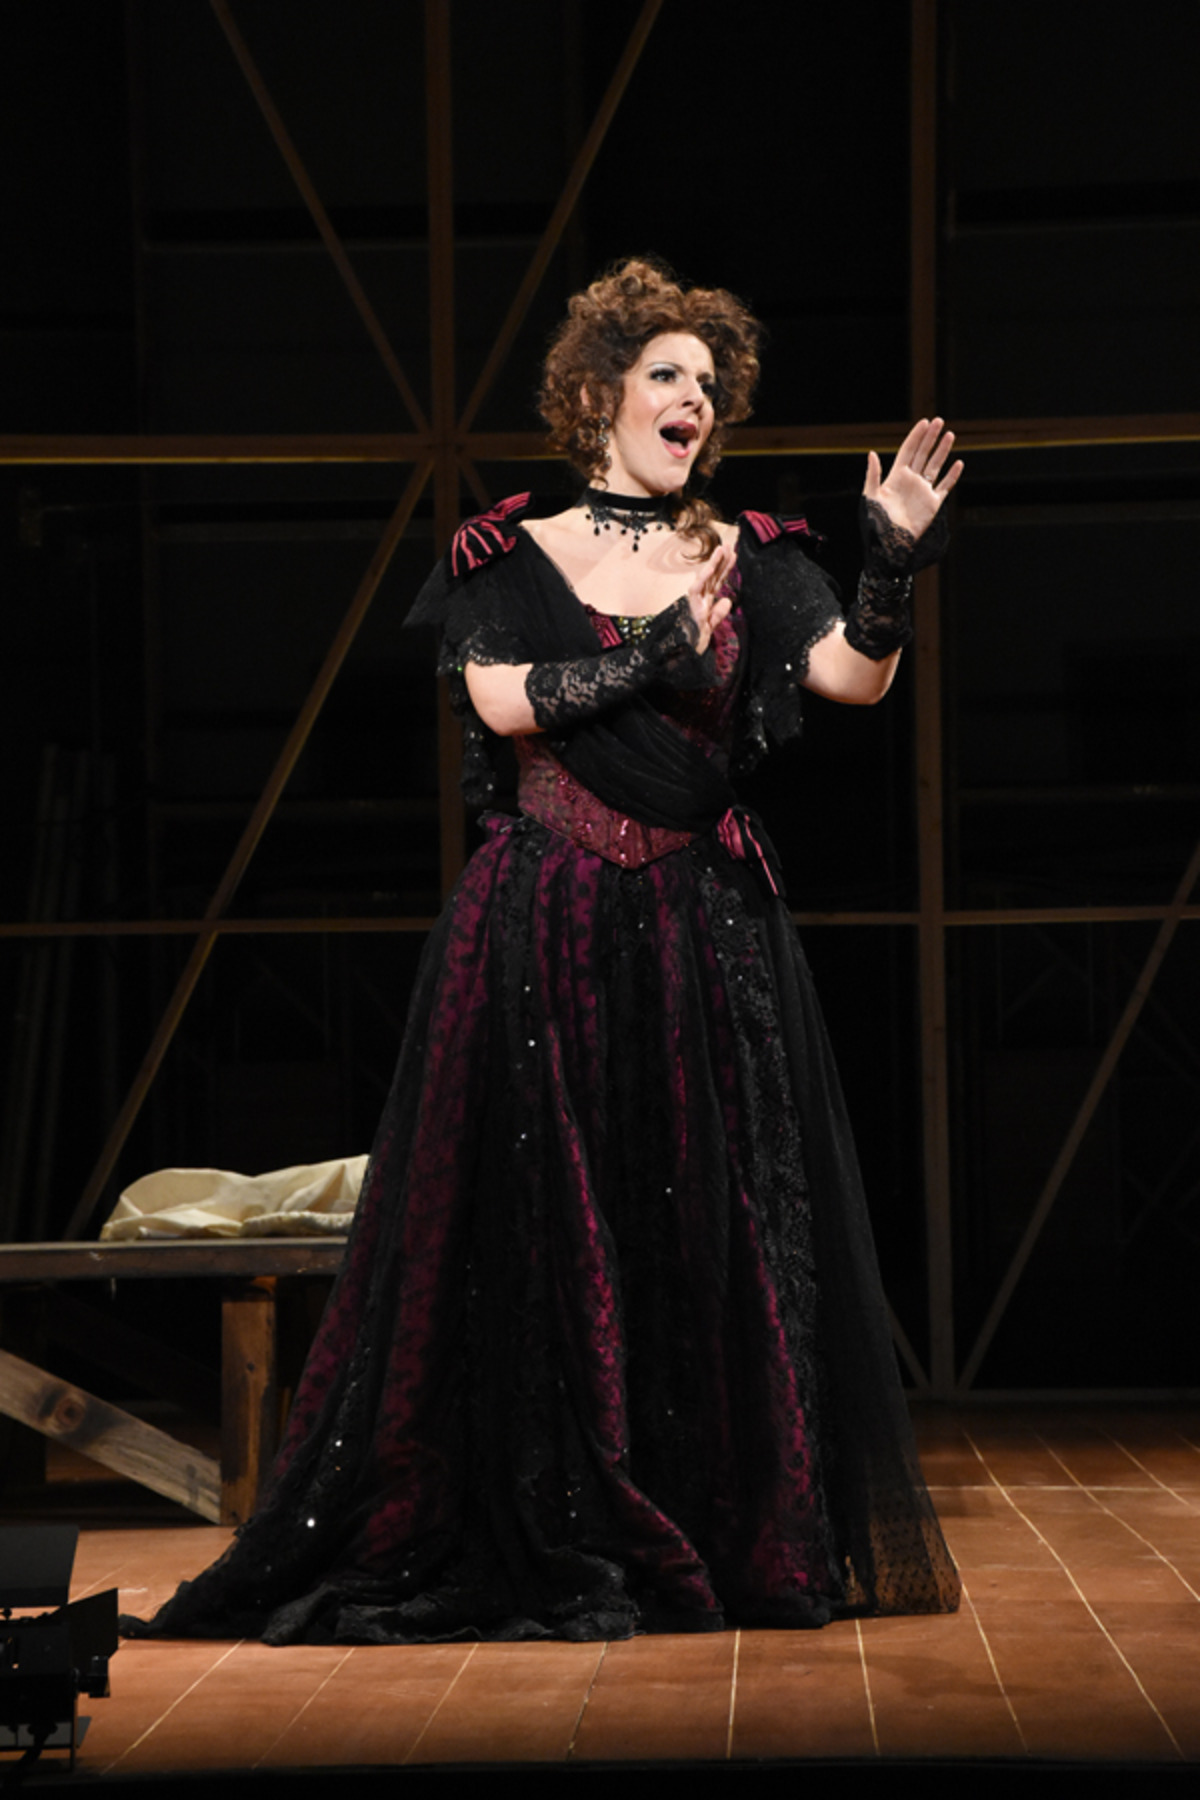 Nell Gwynn (S. Apostolou) auditions - Photo by Tina Buckman